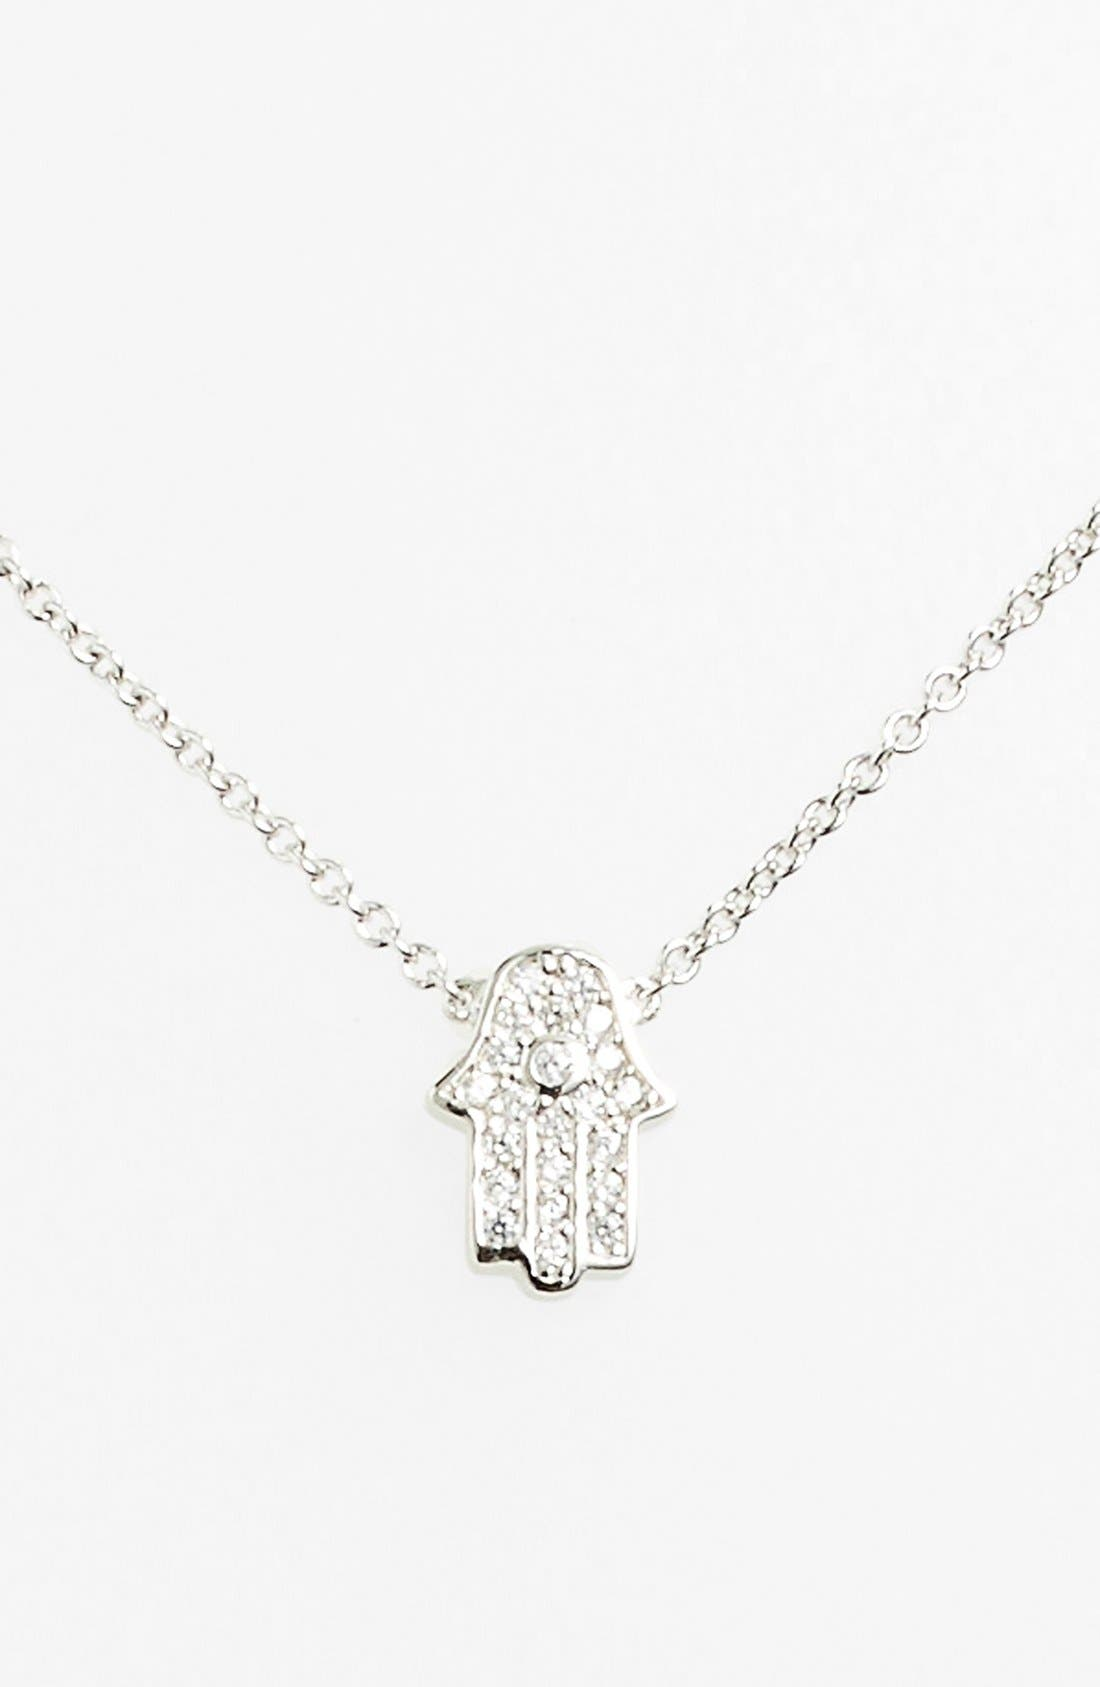 Alternate Image 1 Selected - Sugar Bean Jewelry Pavé Hamsa Pendant Necklace